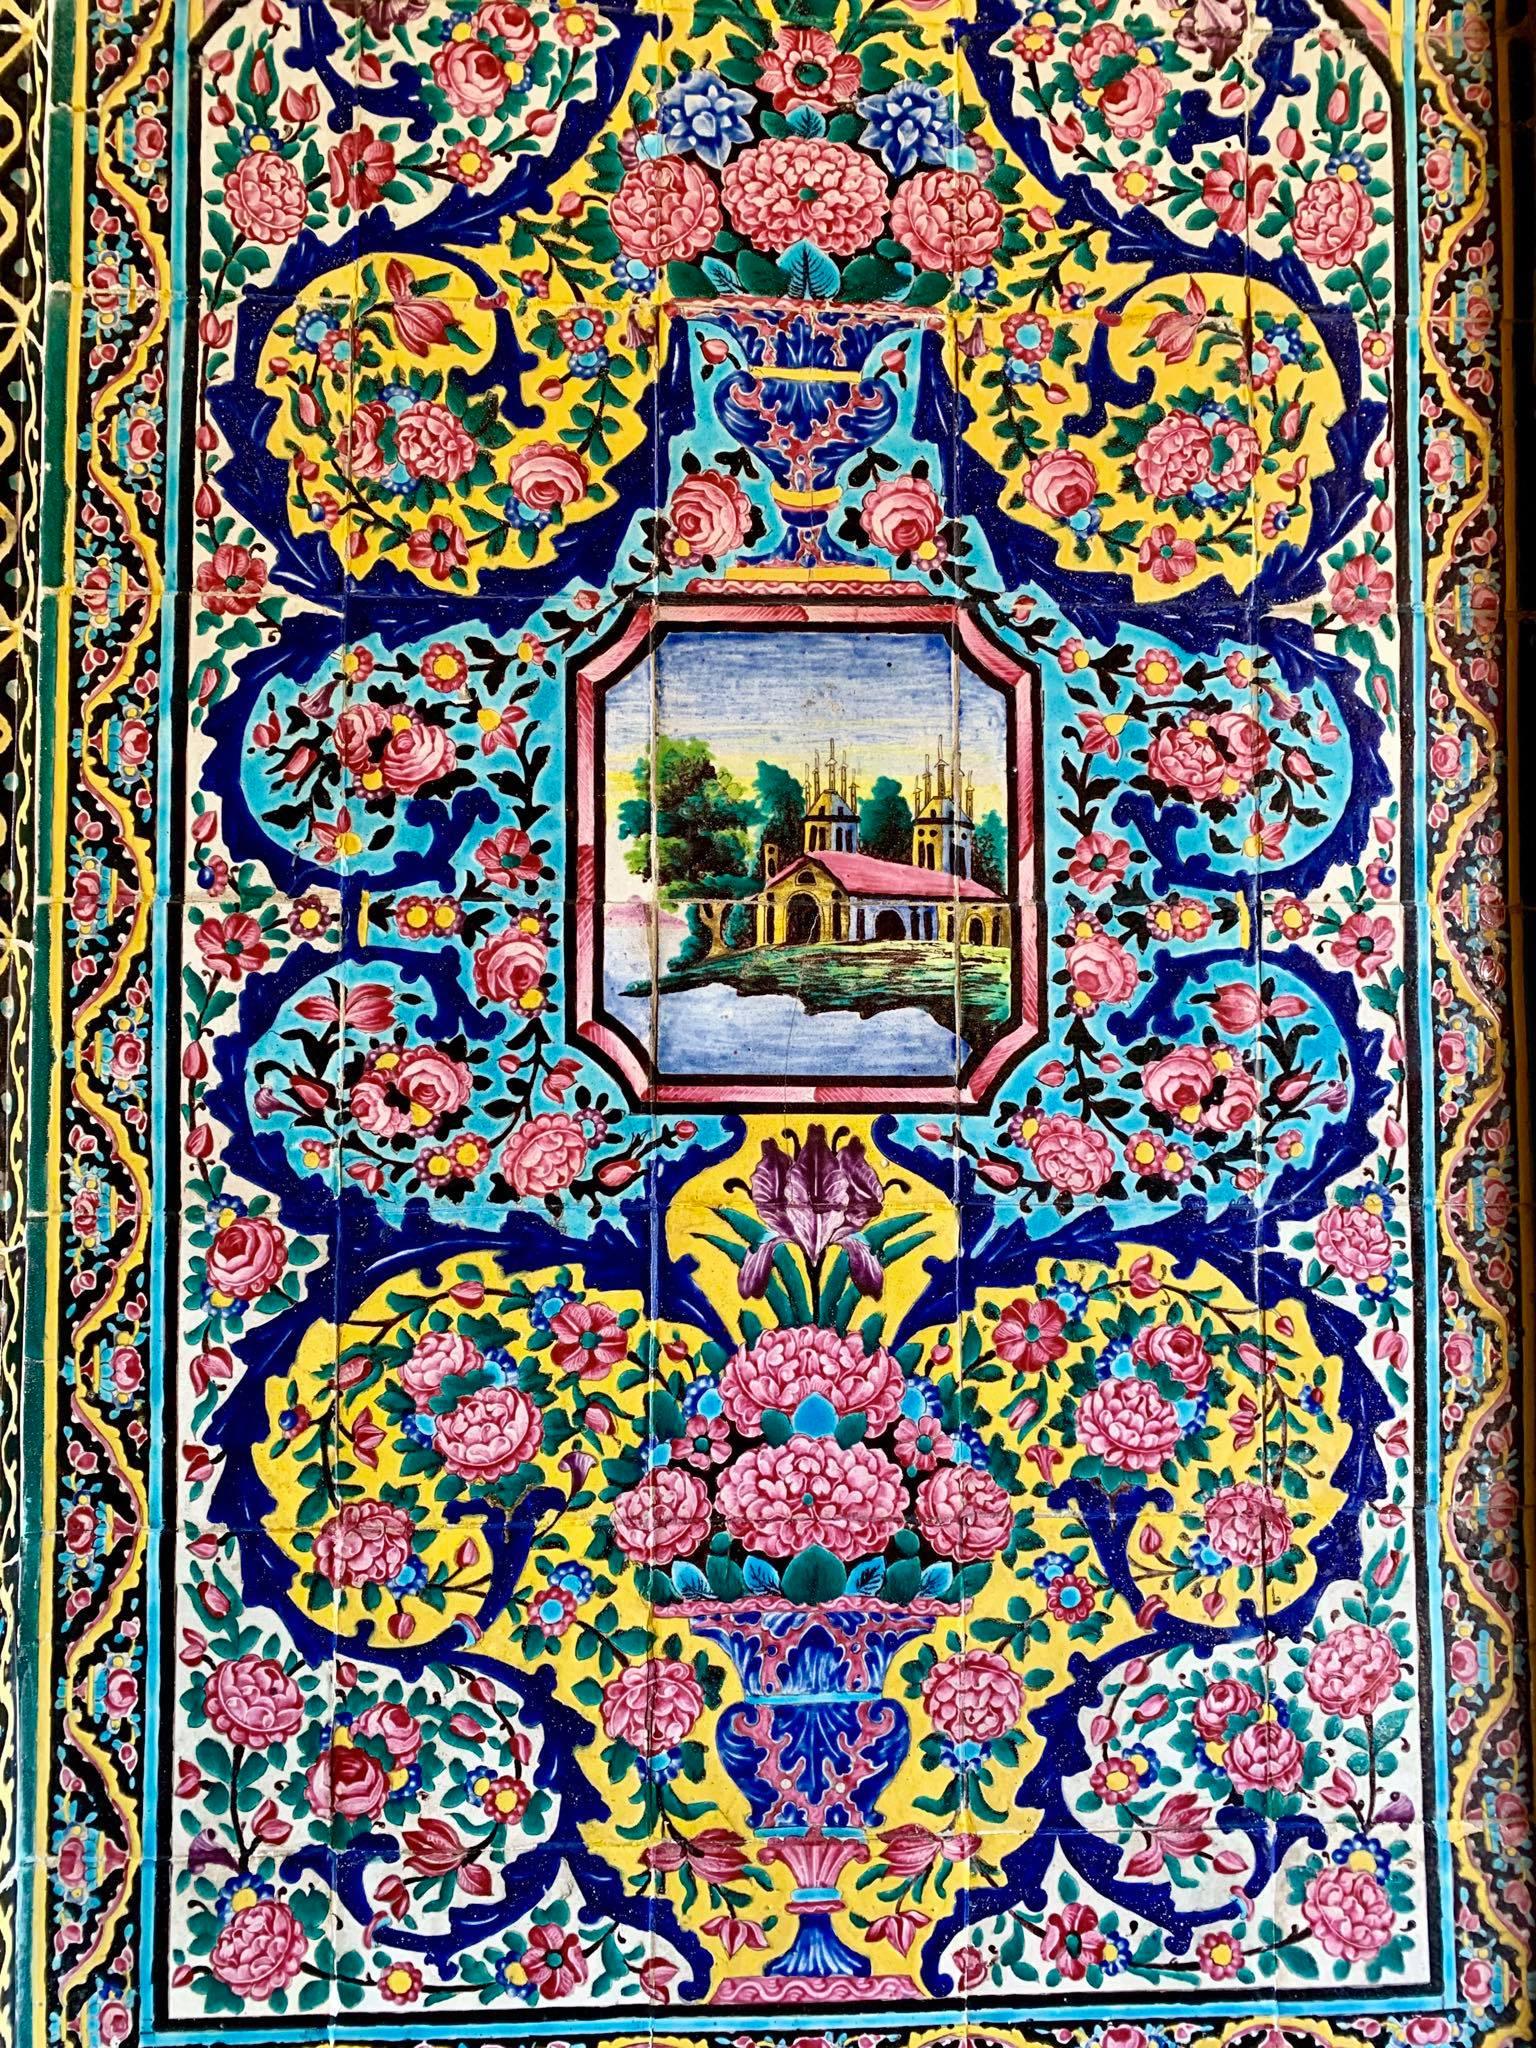 Kach Solo Travels in 2019 Good morning from SHIRAZ, IRAN3.jpg